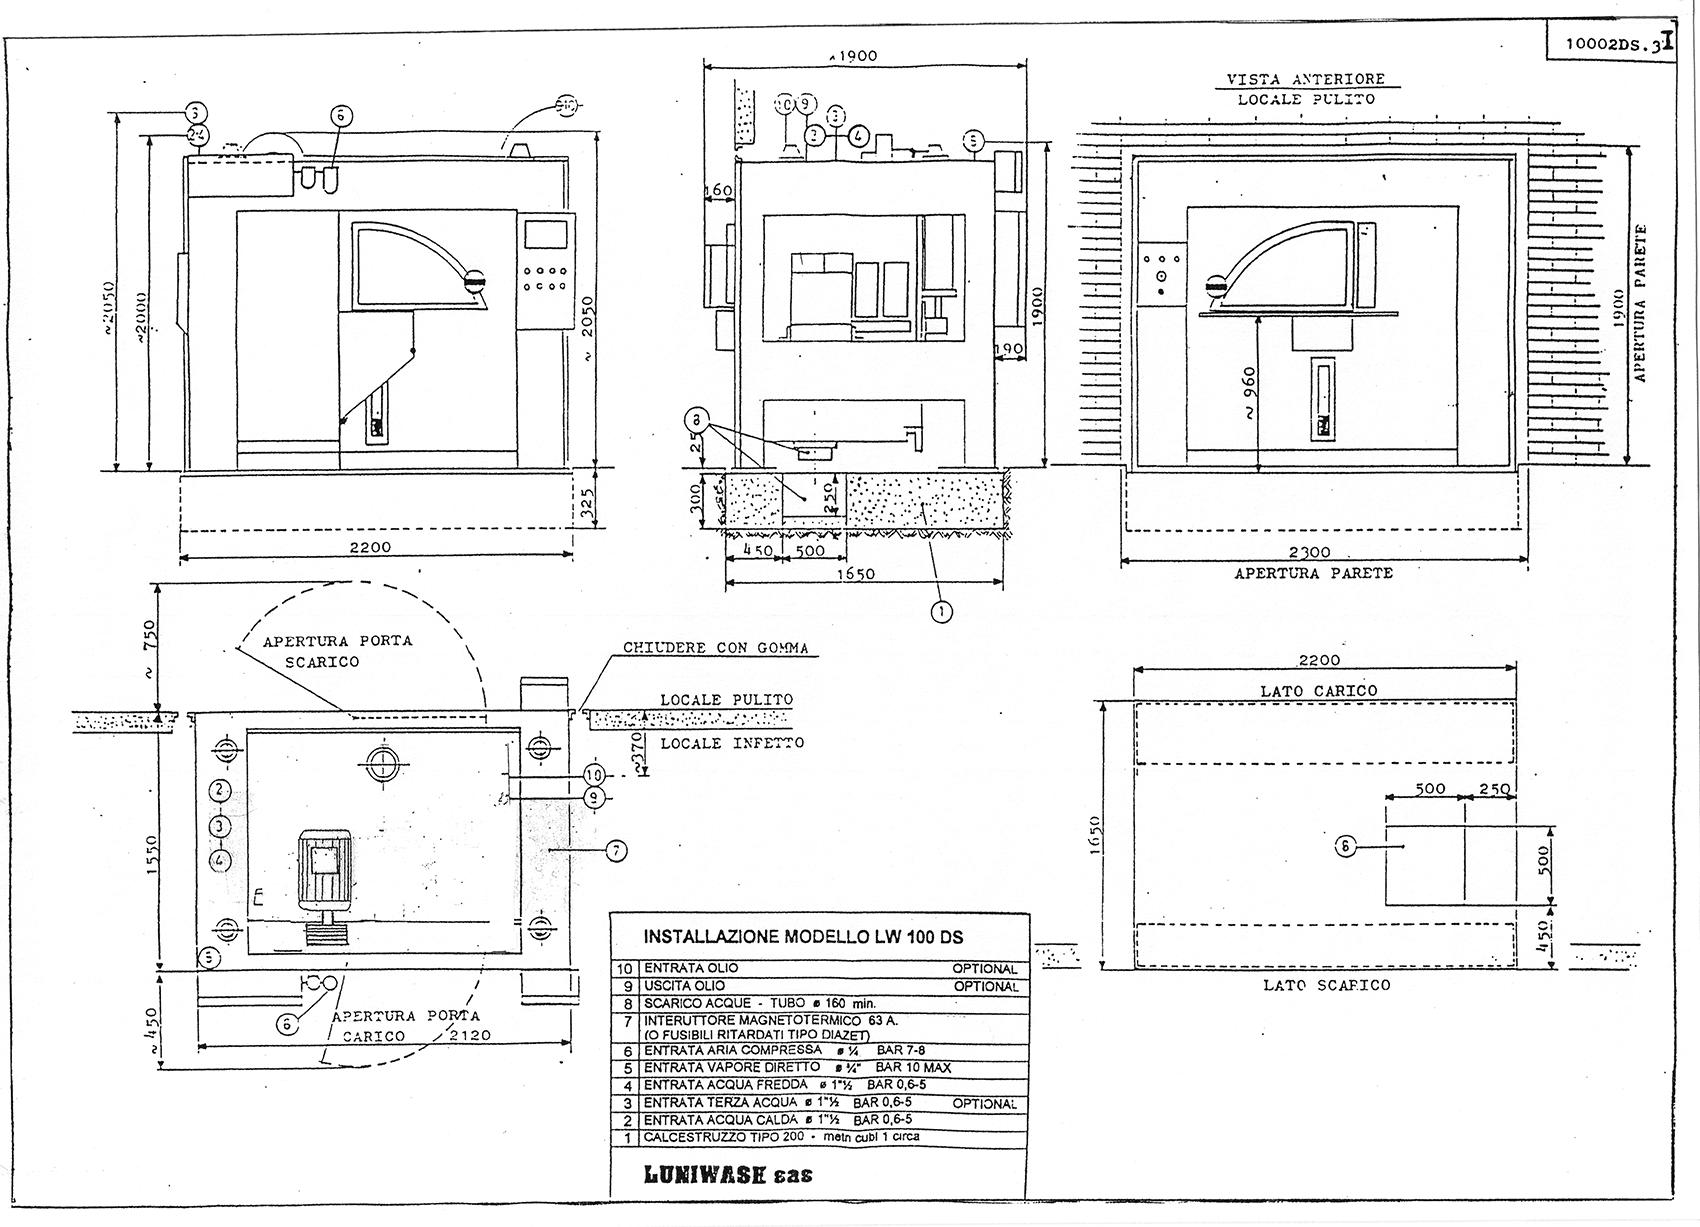 Scheda tecnica lavatrice industriale lw 100 ds luniwash for Peso lavatrice